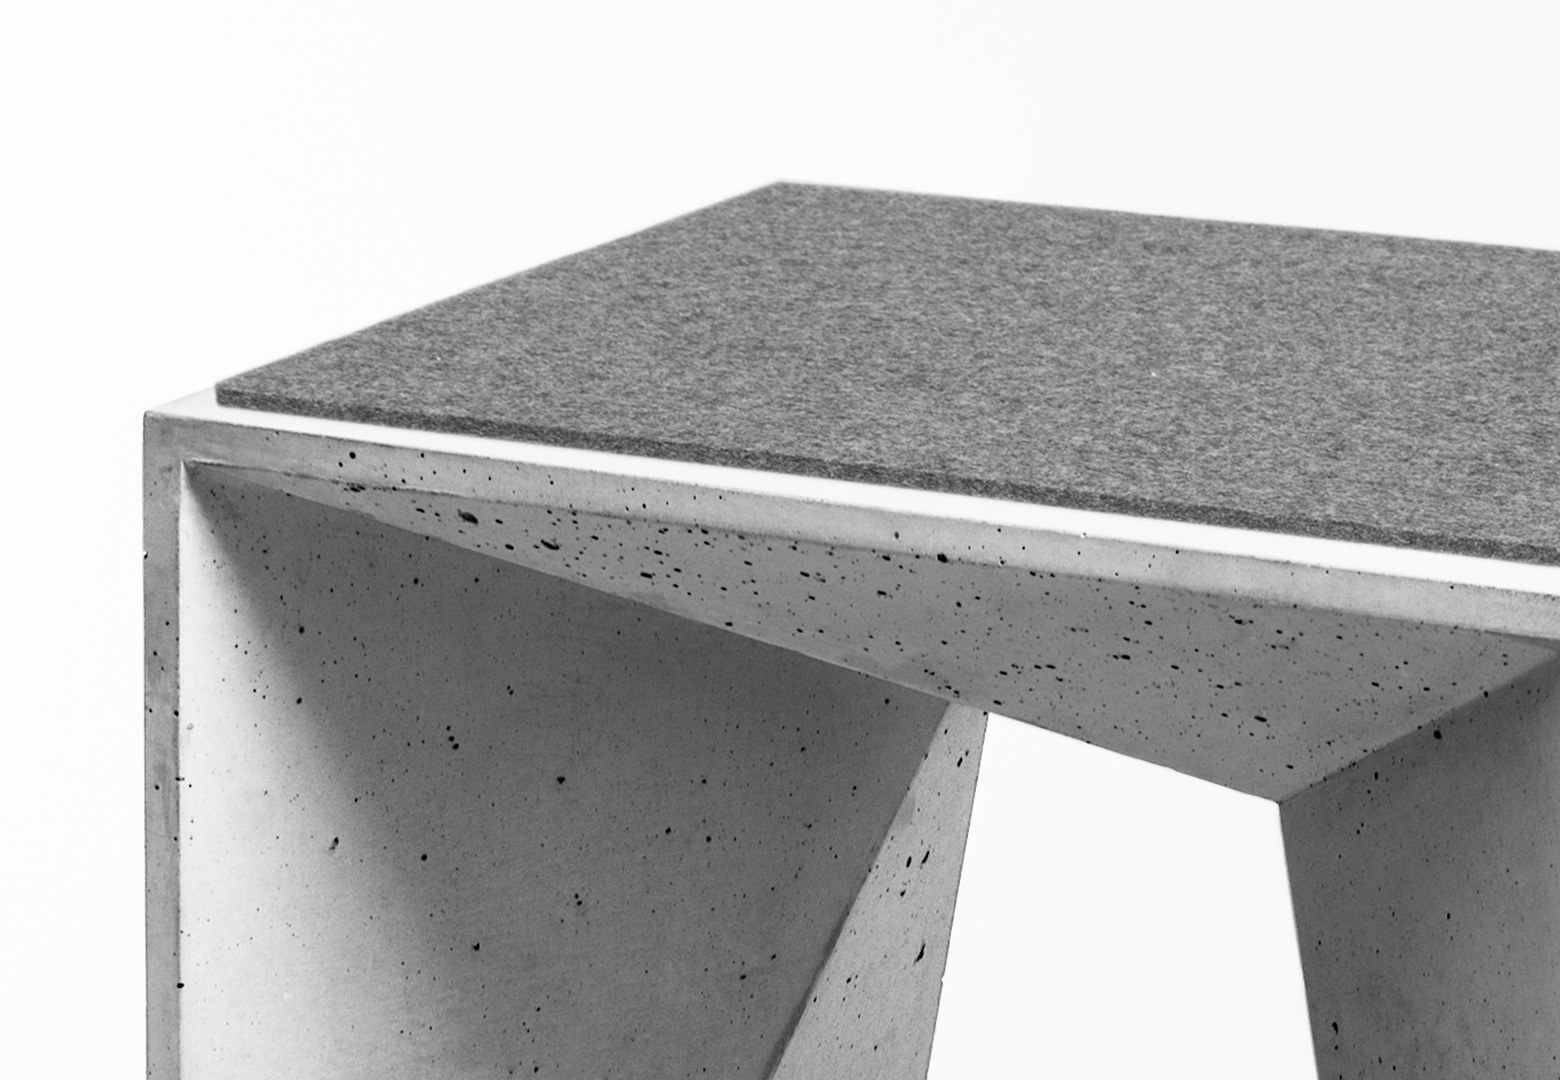 HOCKER HEINRICH Concrete Stool by Panatom & Matthias Froböse